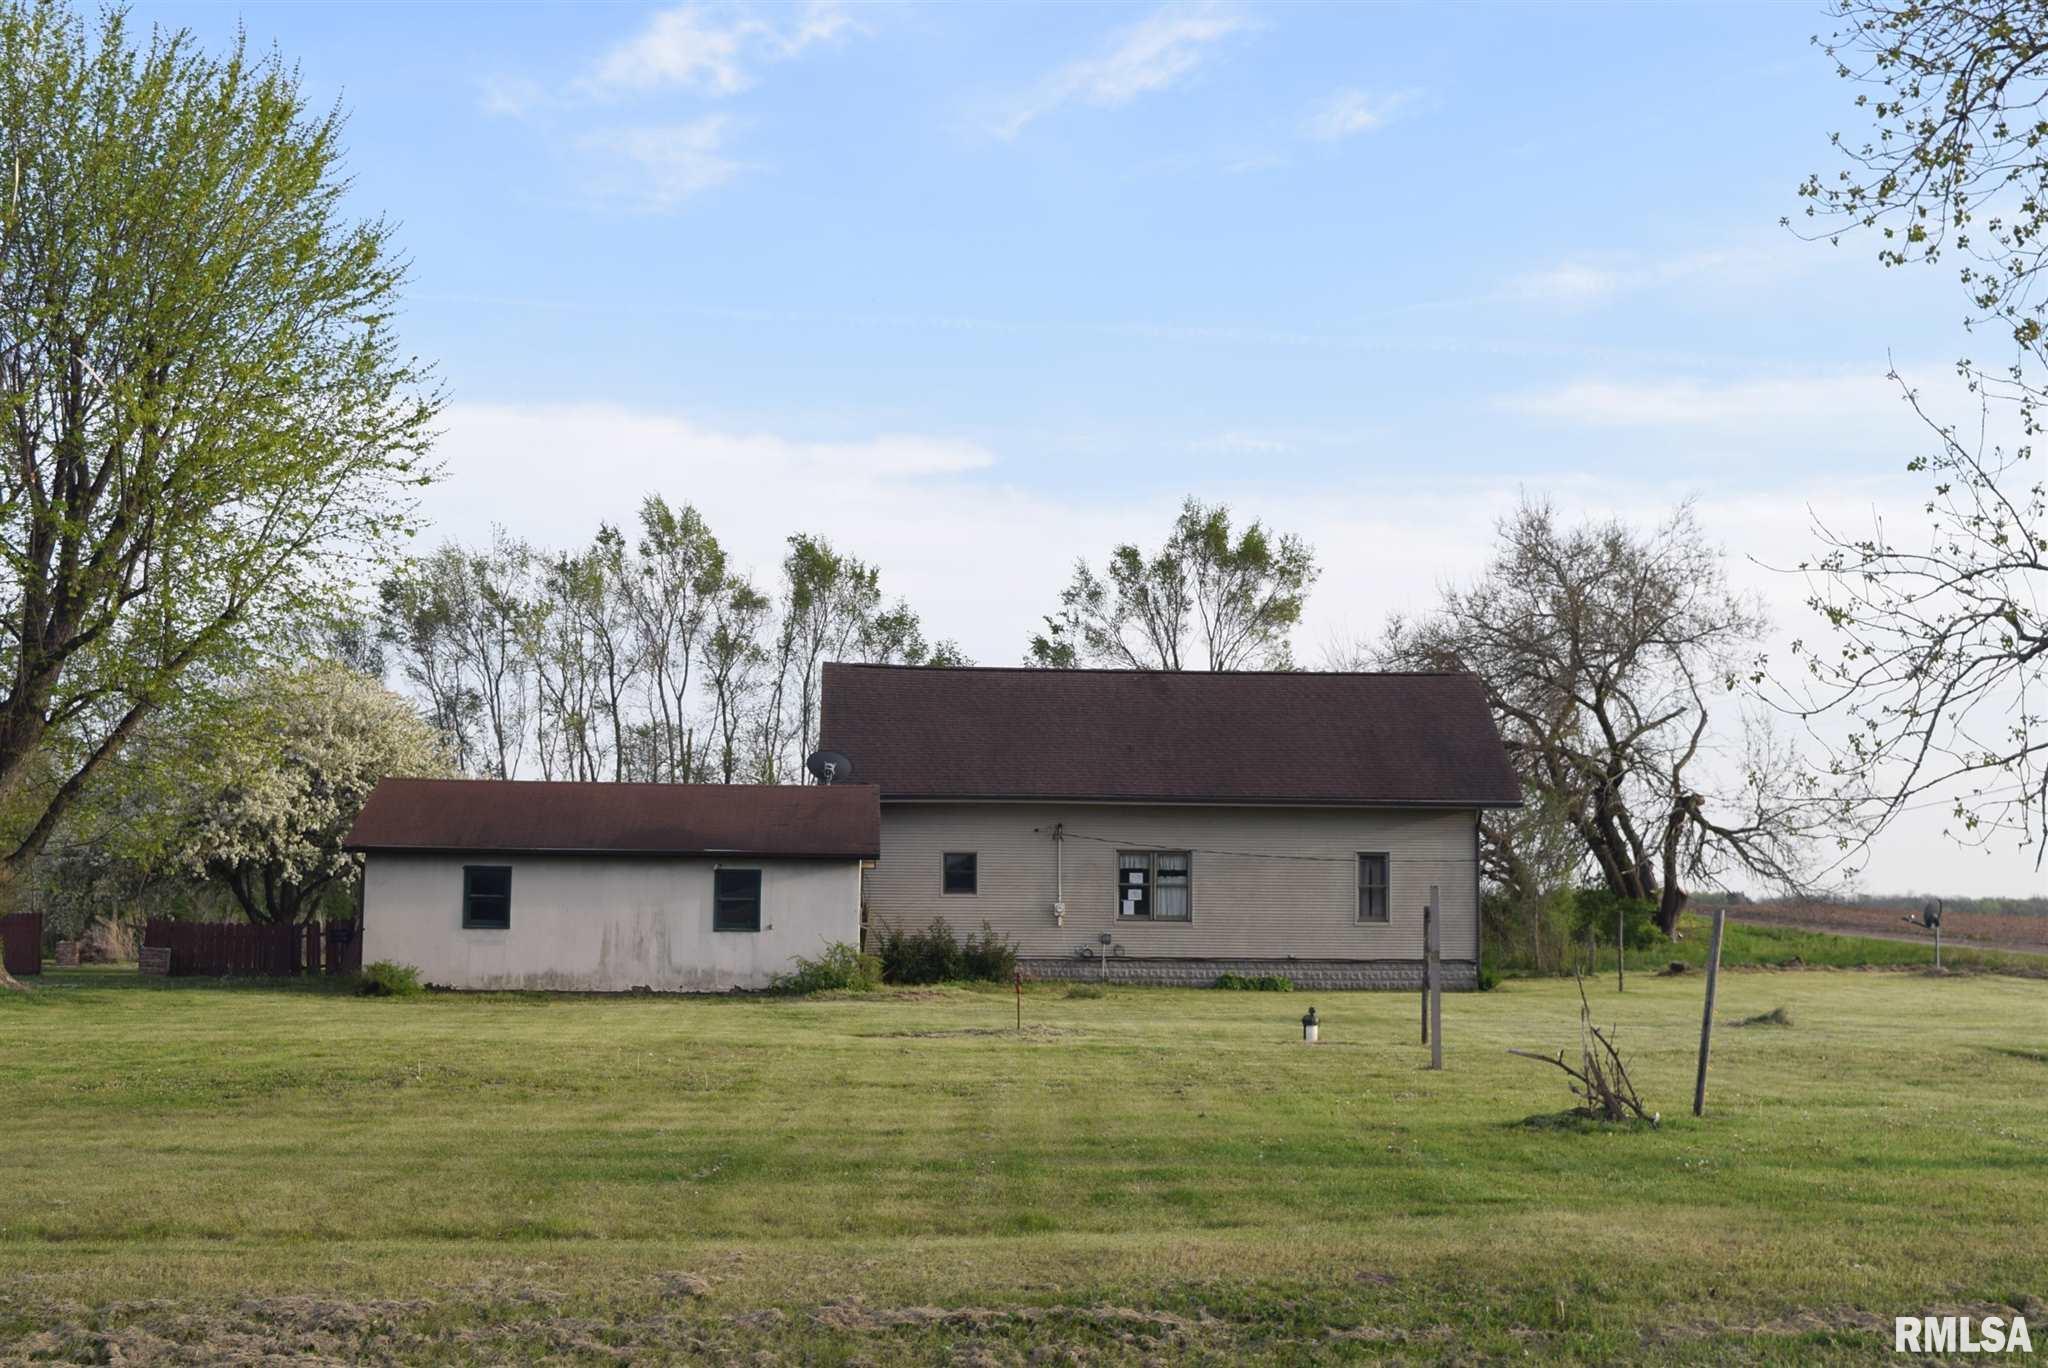 21299 E CR 700 N Property Photo - Kilbourne, IL real estate listing